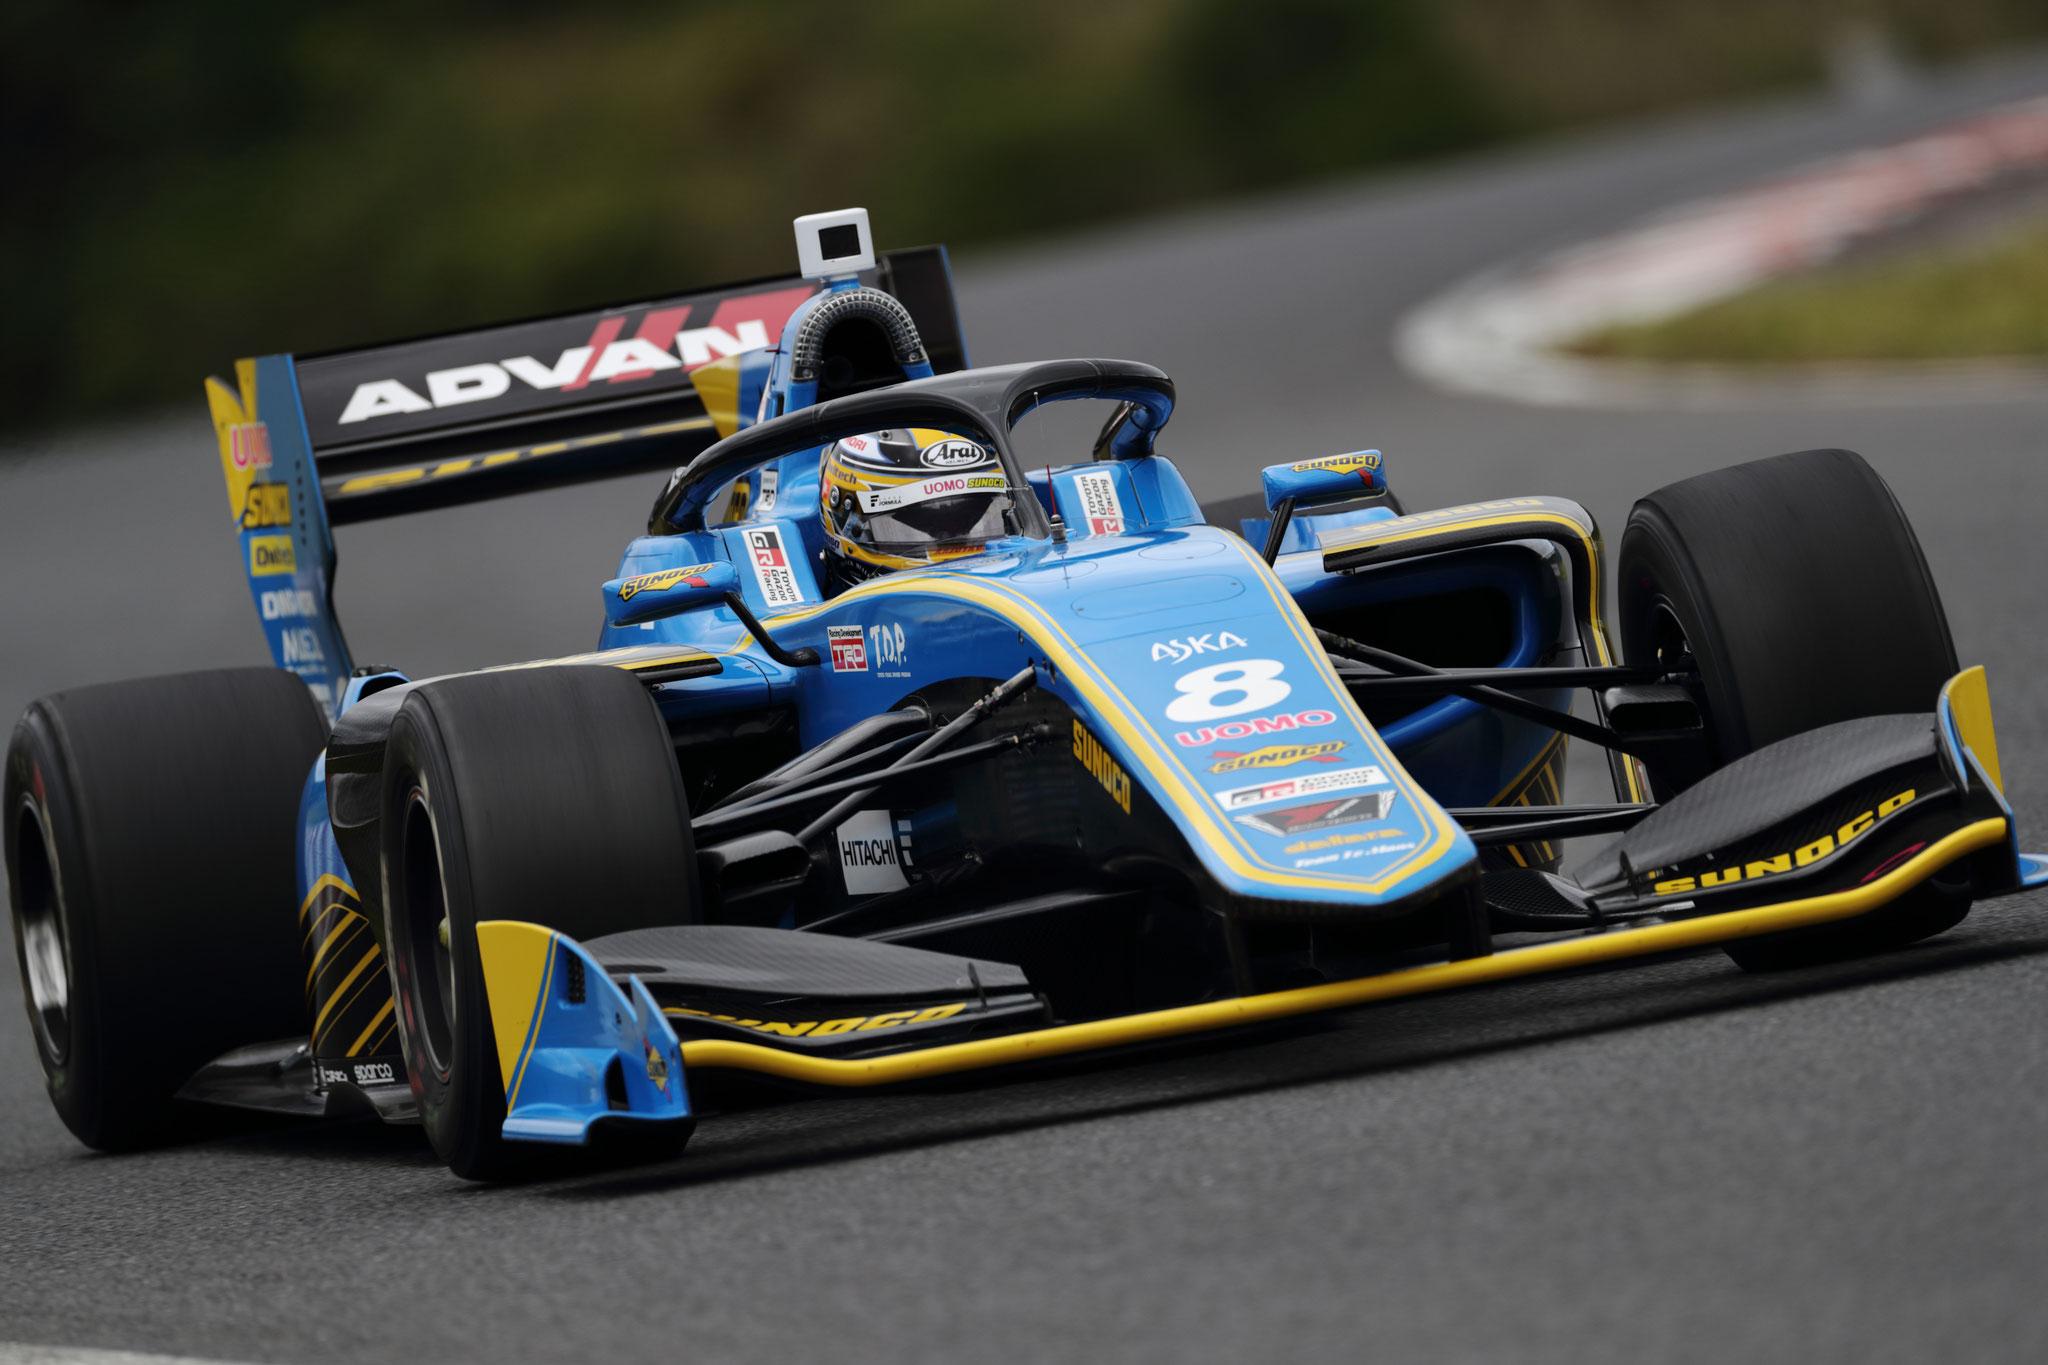 大嶋和也 2019 SUPER FORMULA Round2 決勝 AUTOPOLIS